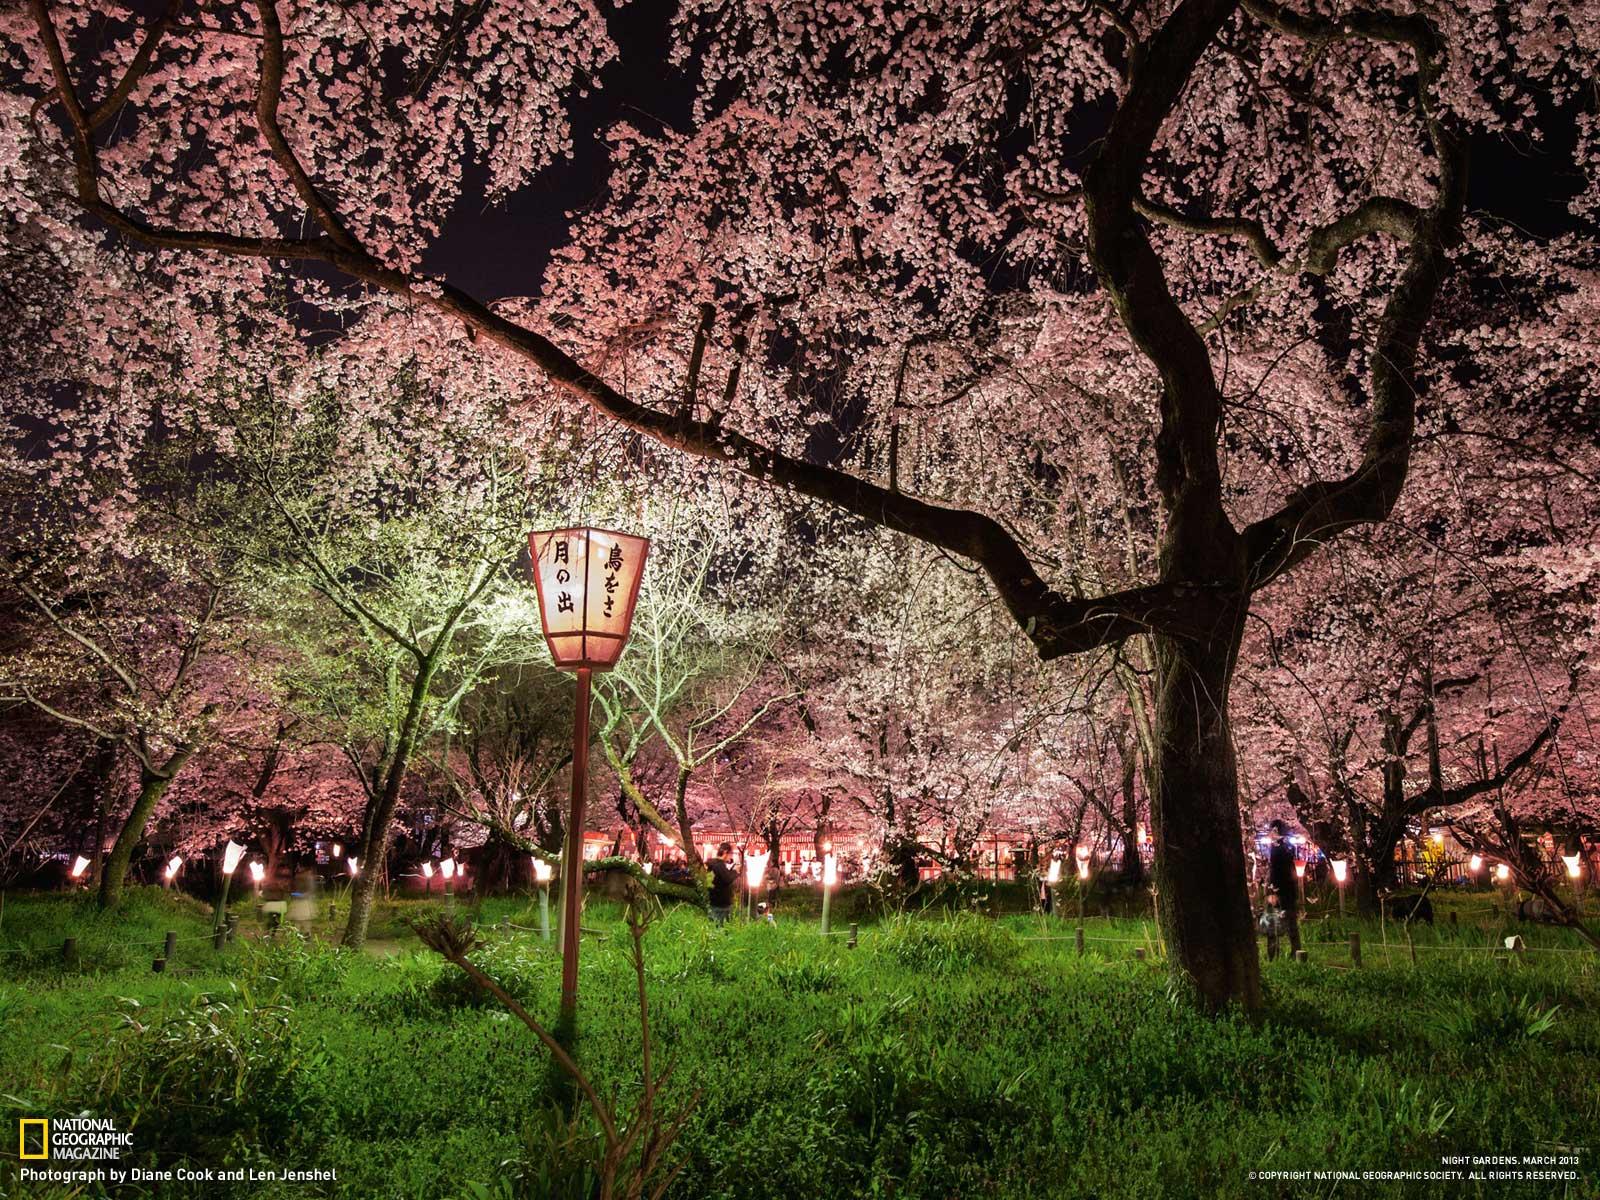 Cool Wallpaper Night Cherry Blossom - kPKrkog  Photograph.jpg